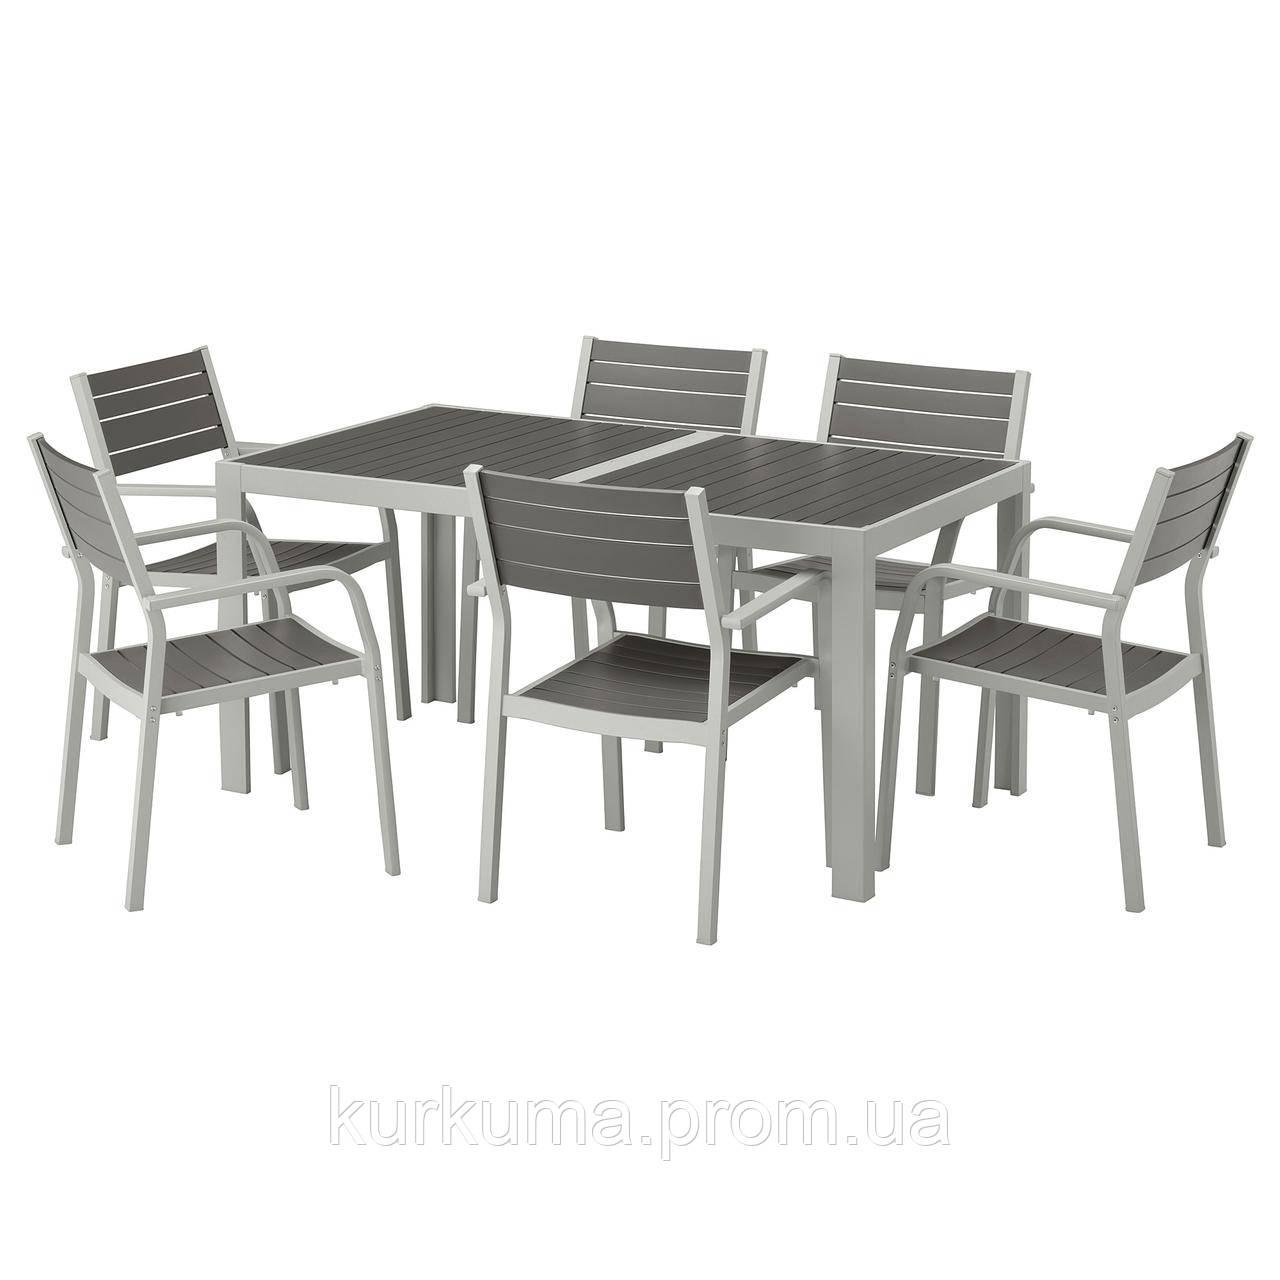 IKEA SJALLAND Садовый стол и 6 стульев, темно-серый (192.652.03)